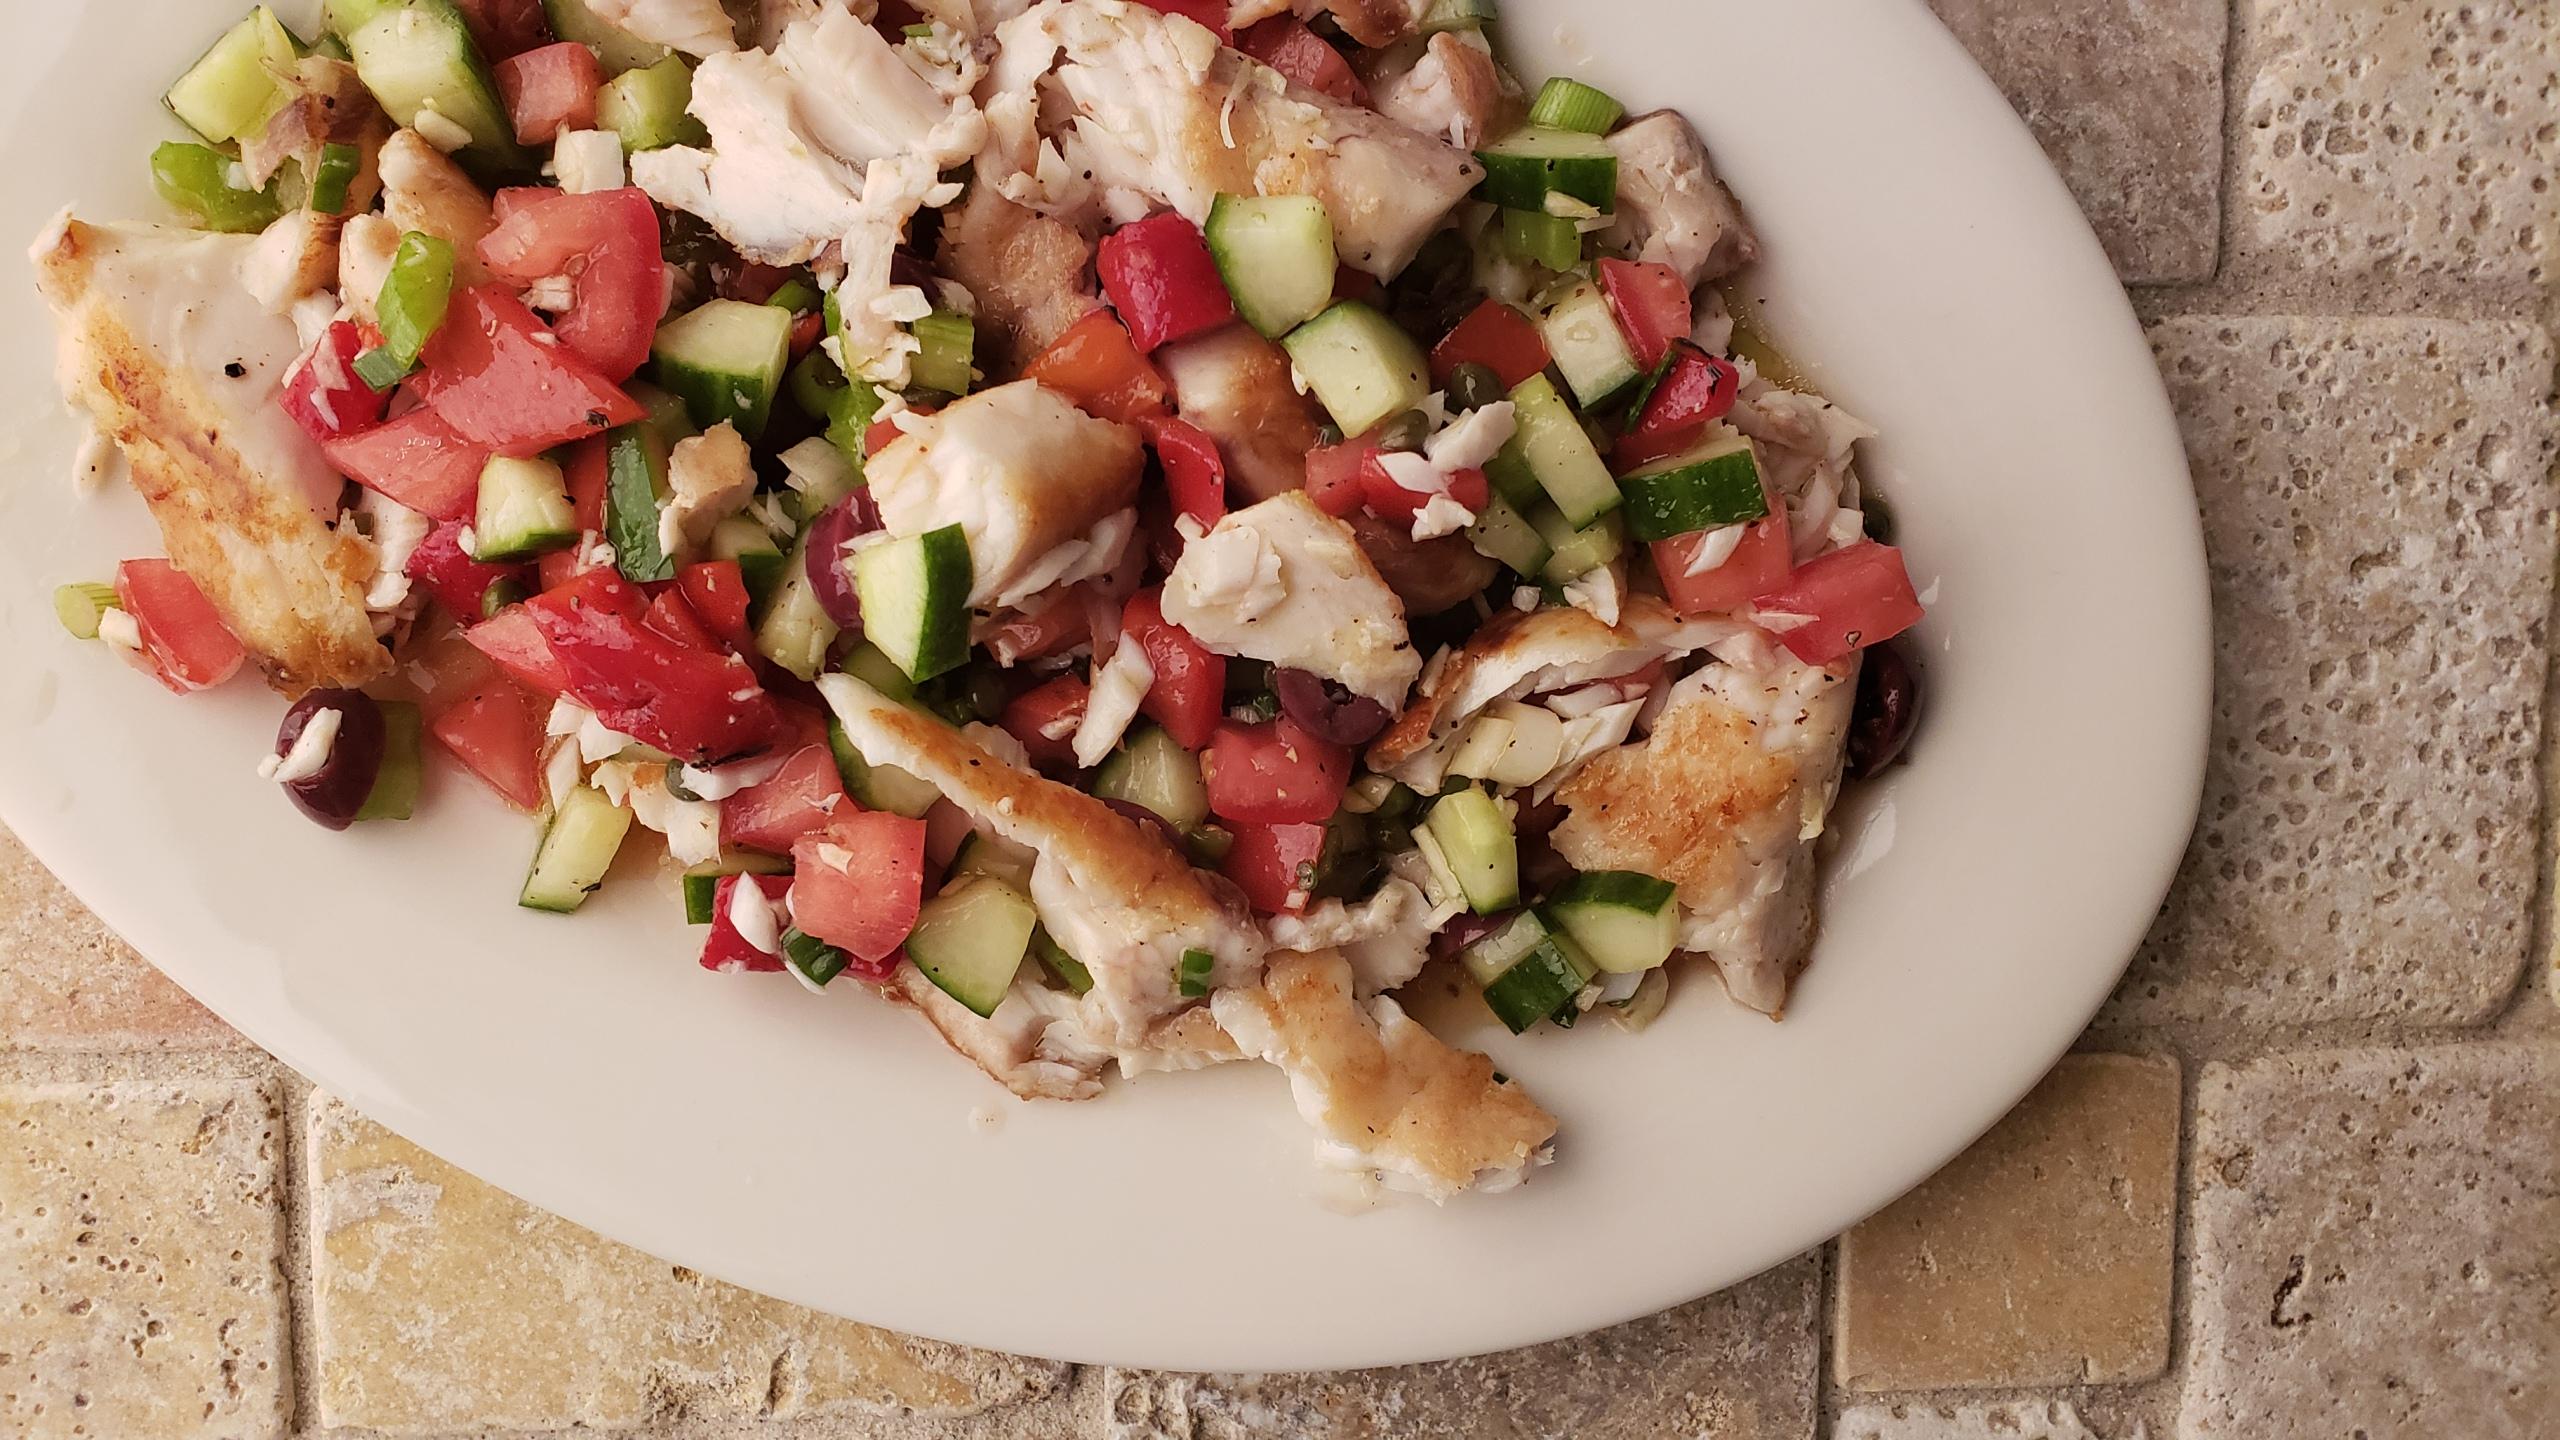 Tripletail Salad by James Beard Award winner, Hank Shaw